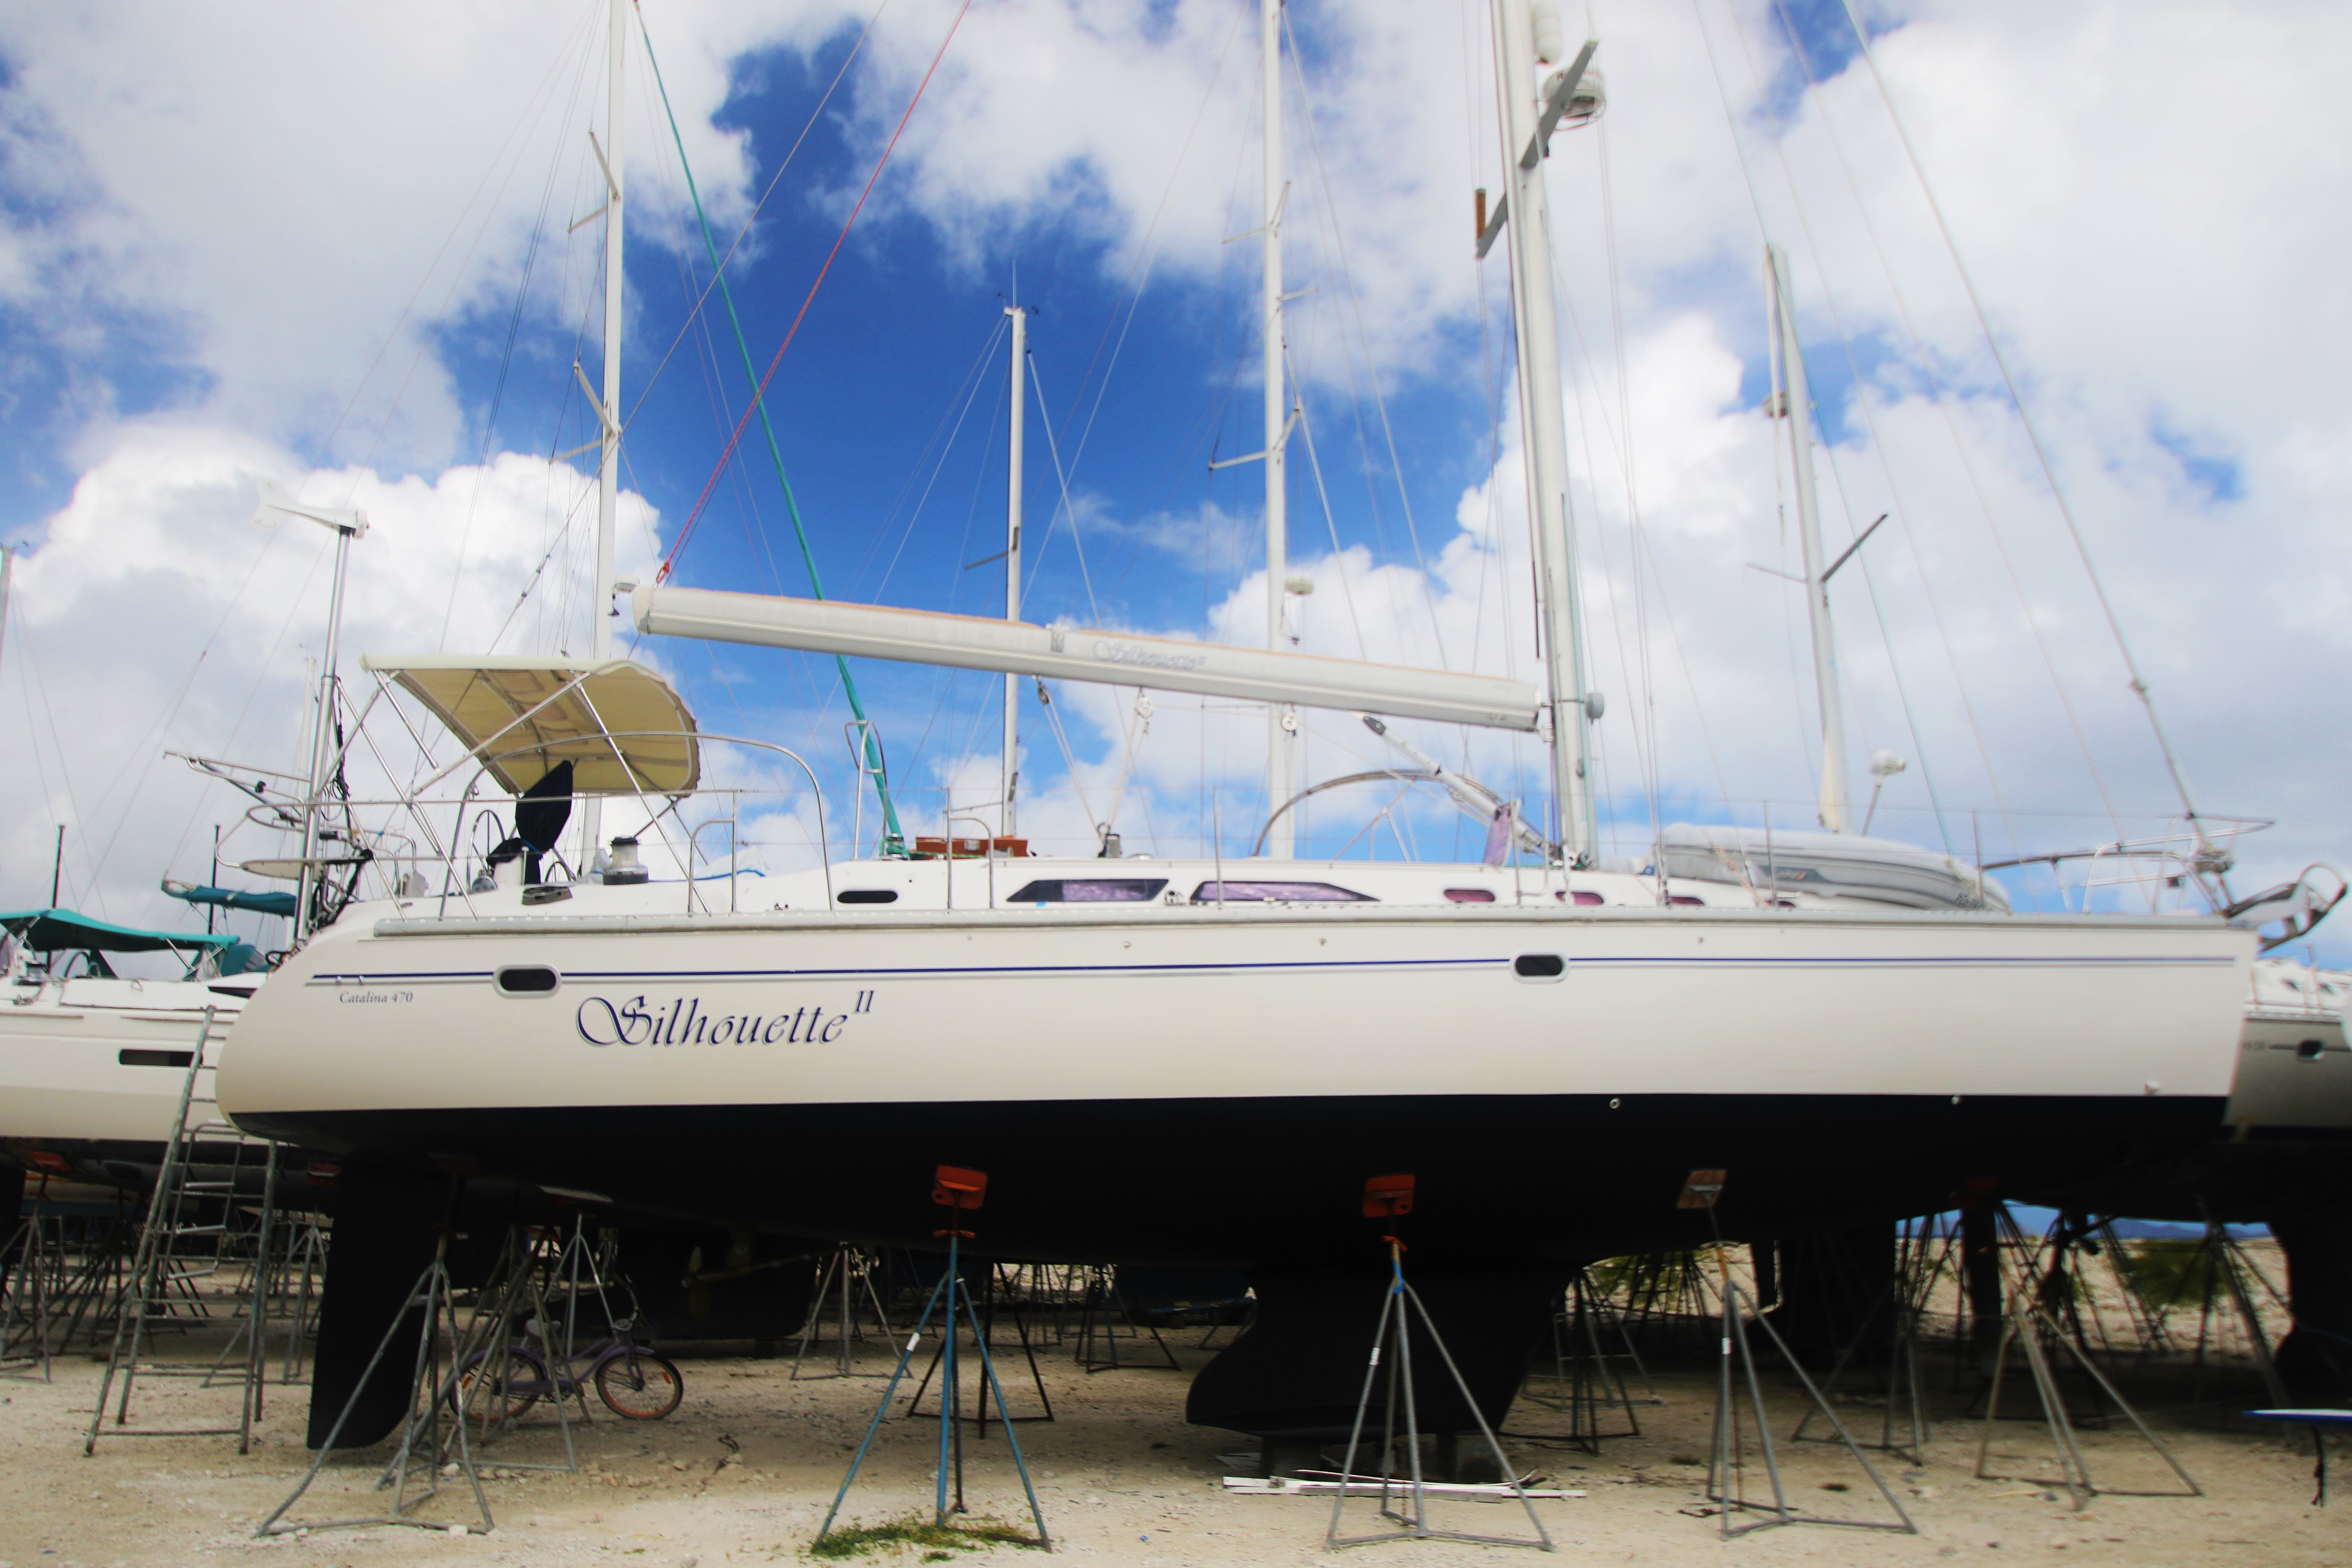 Catalina 470 Silhouette II